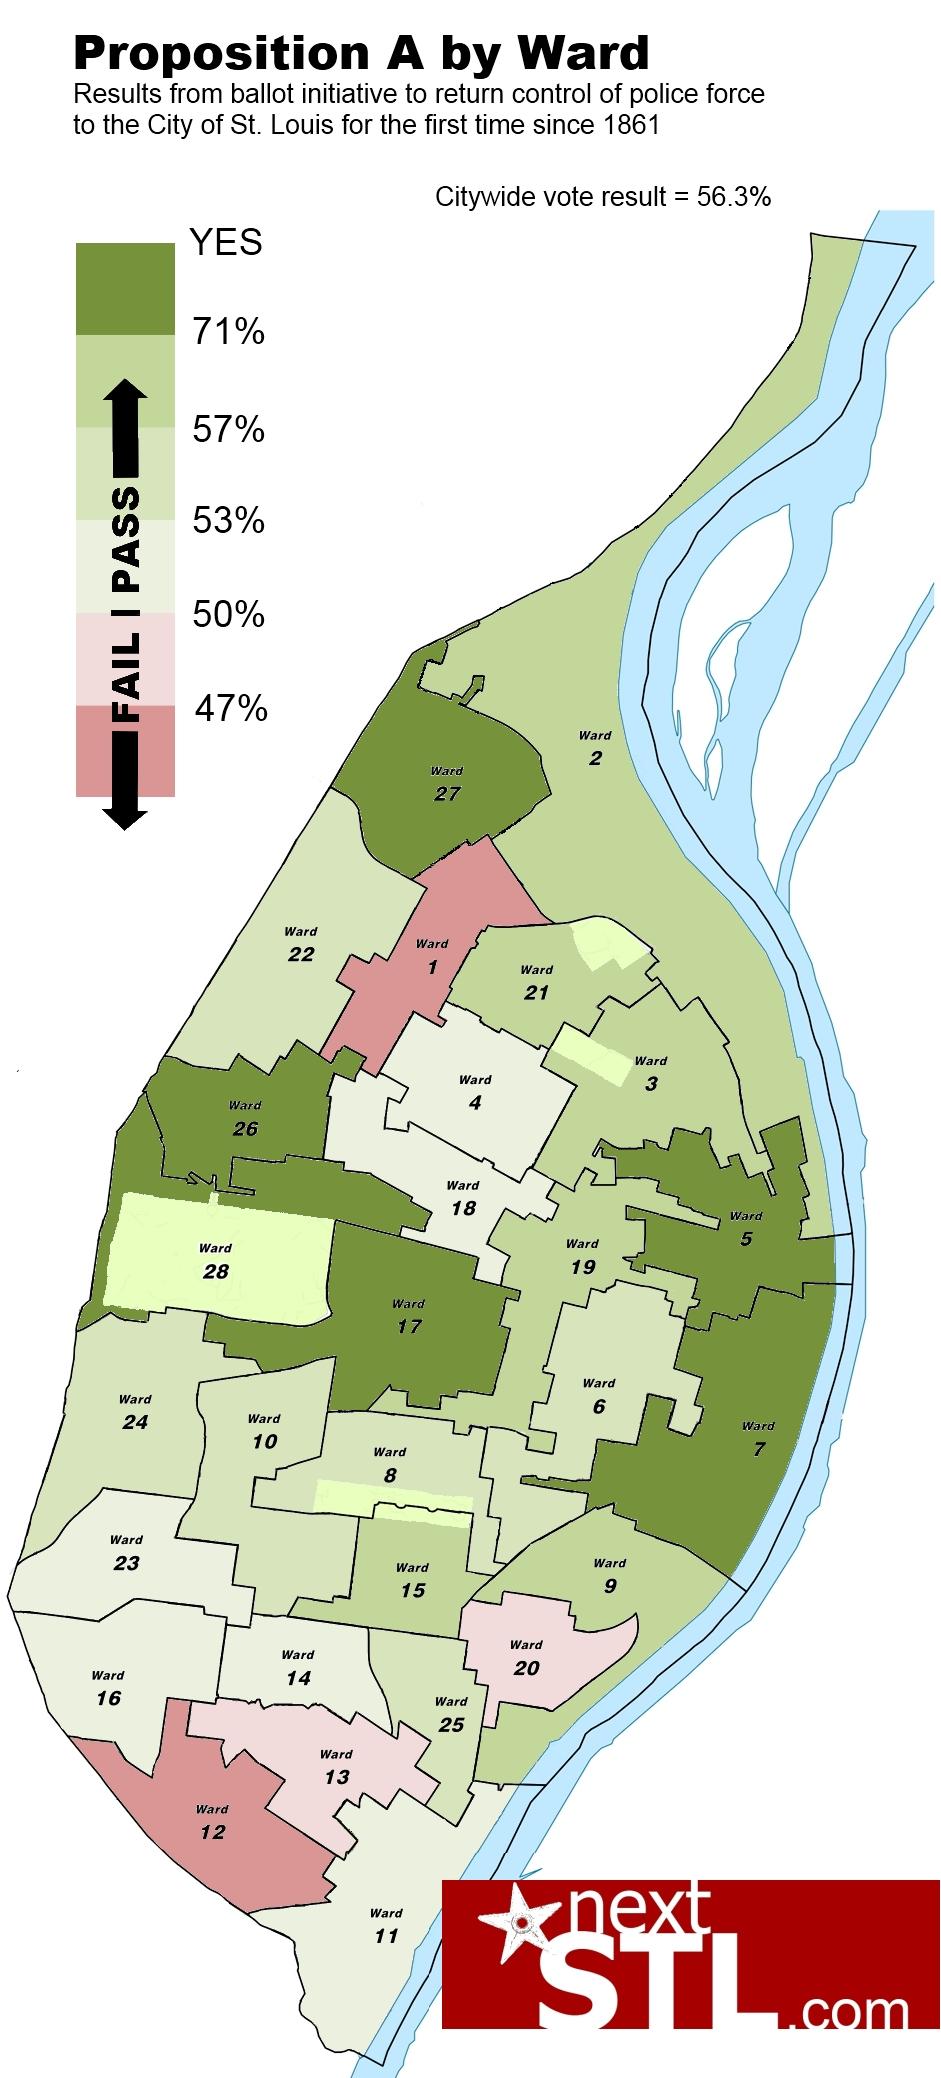 ward map_PropA